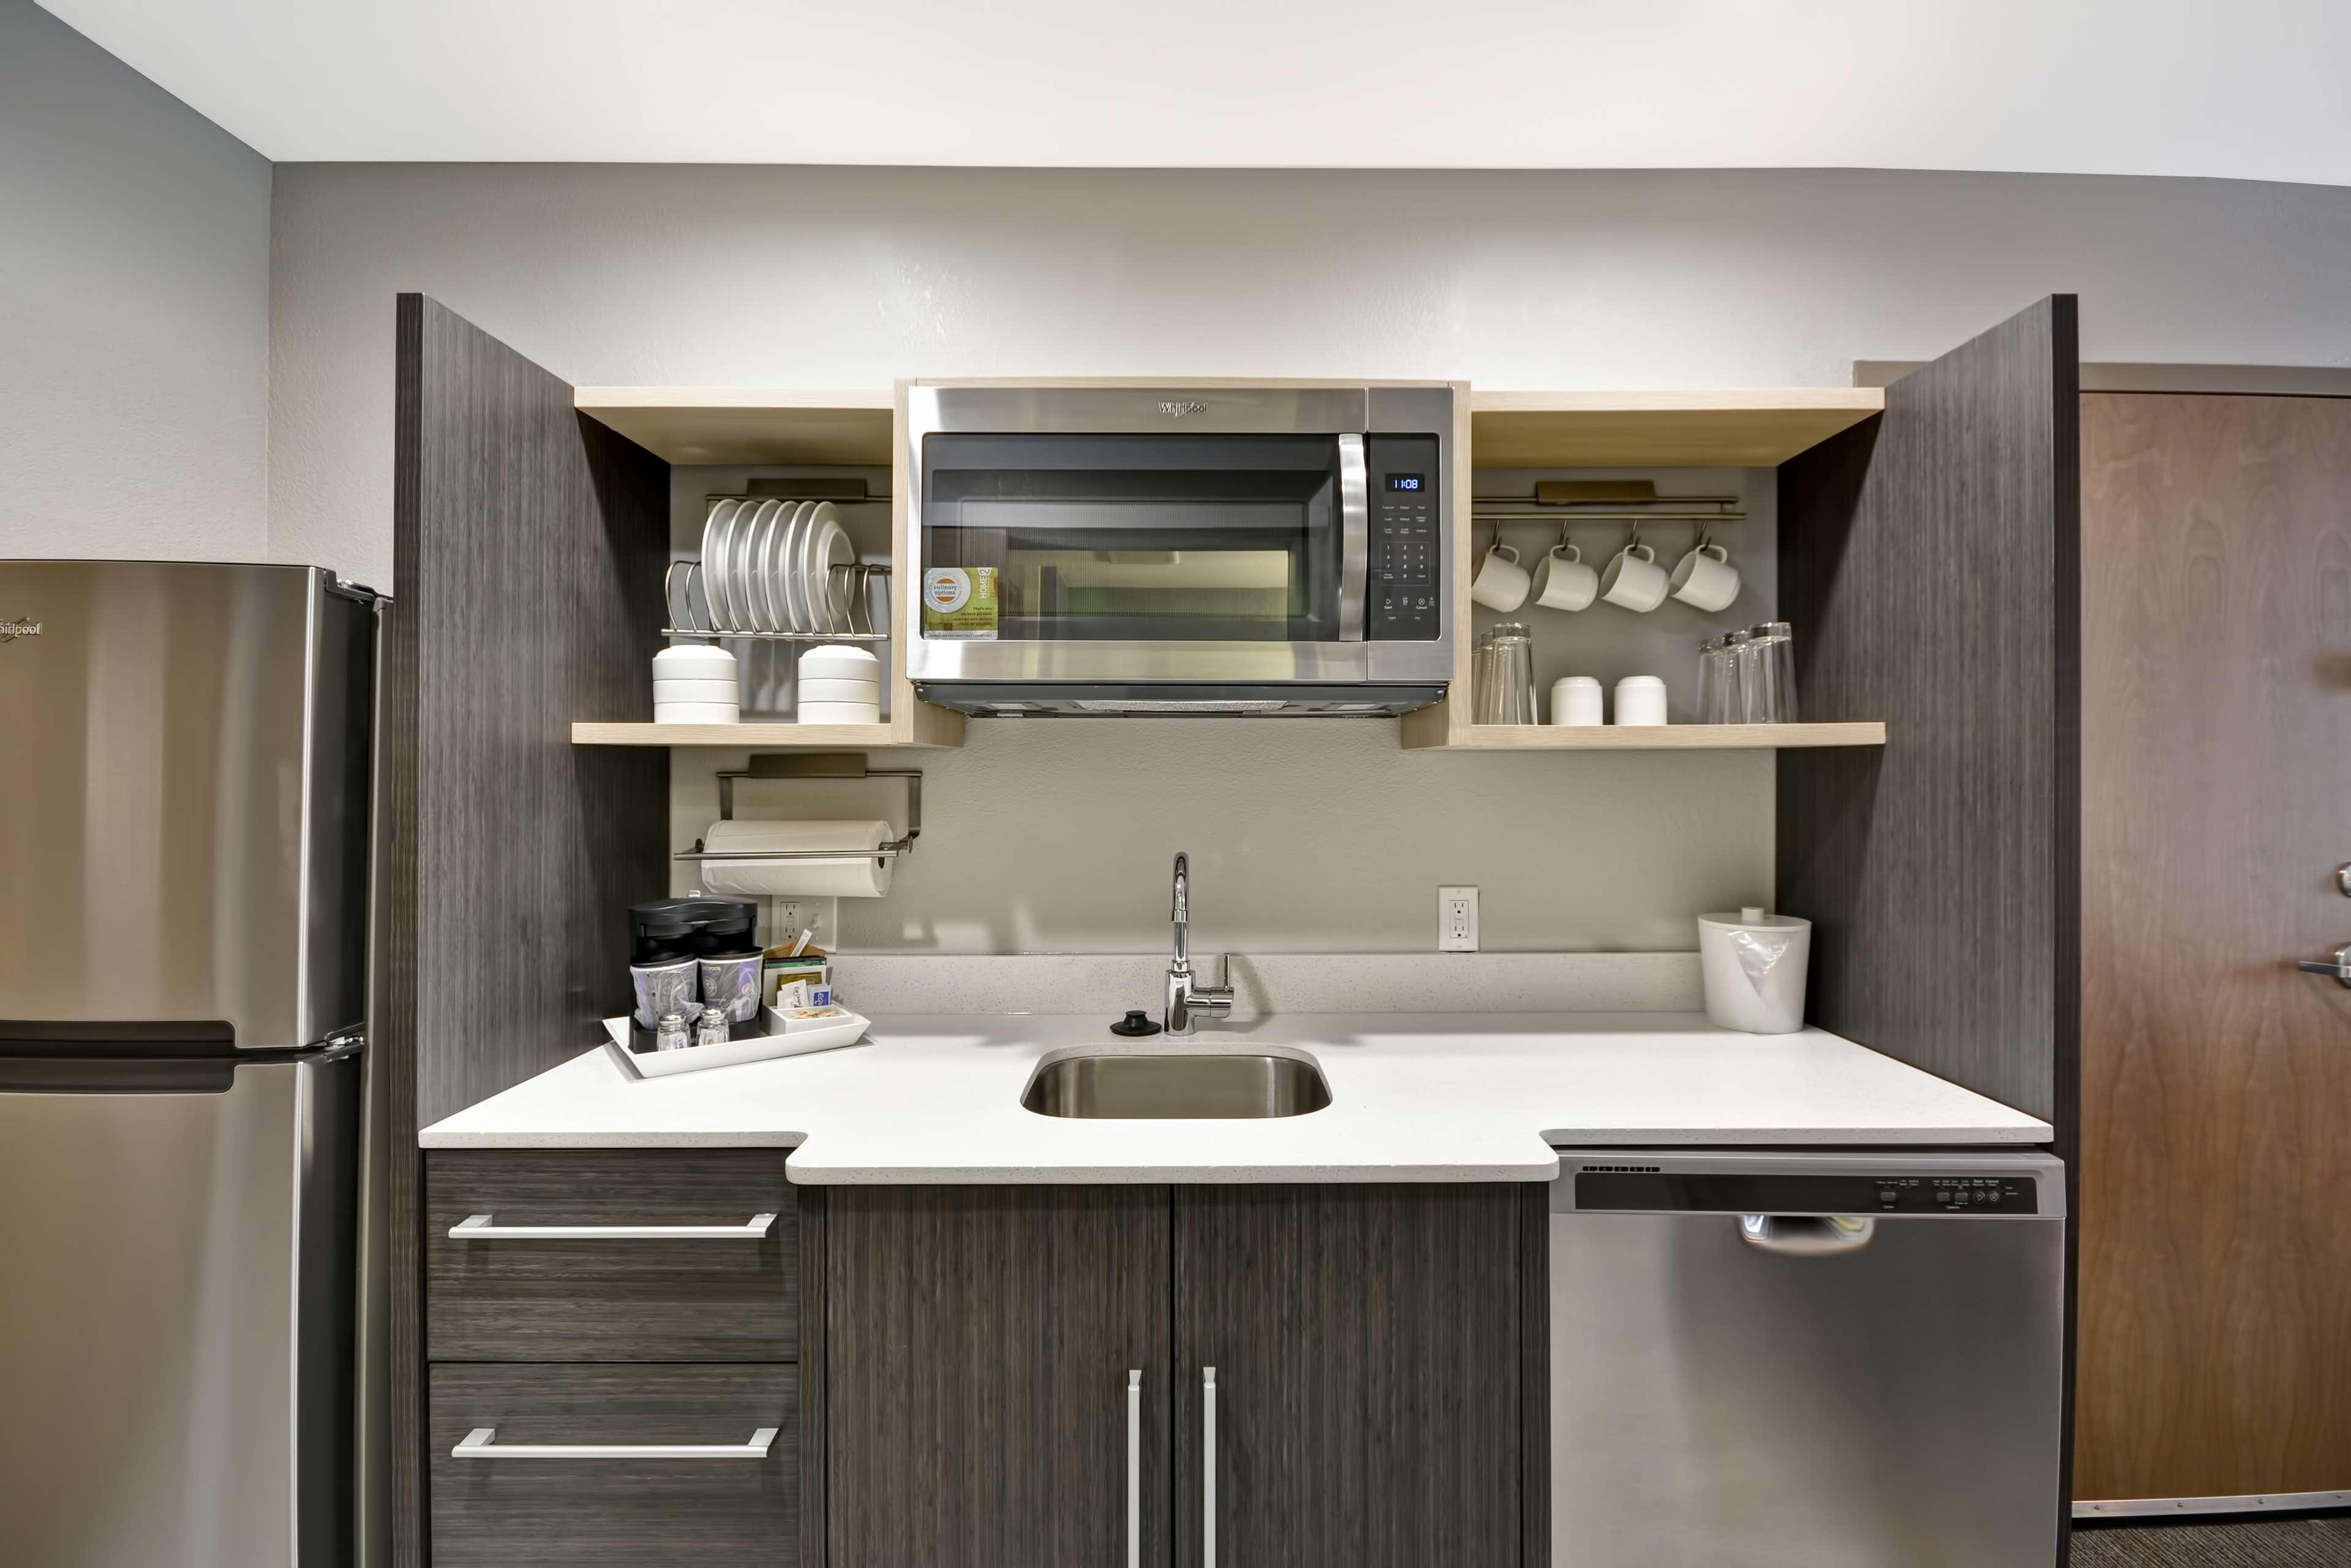 Home2 Suites by Hilton Jackson image 20